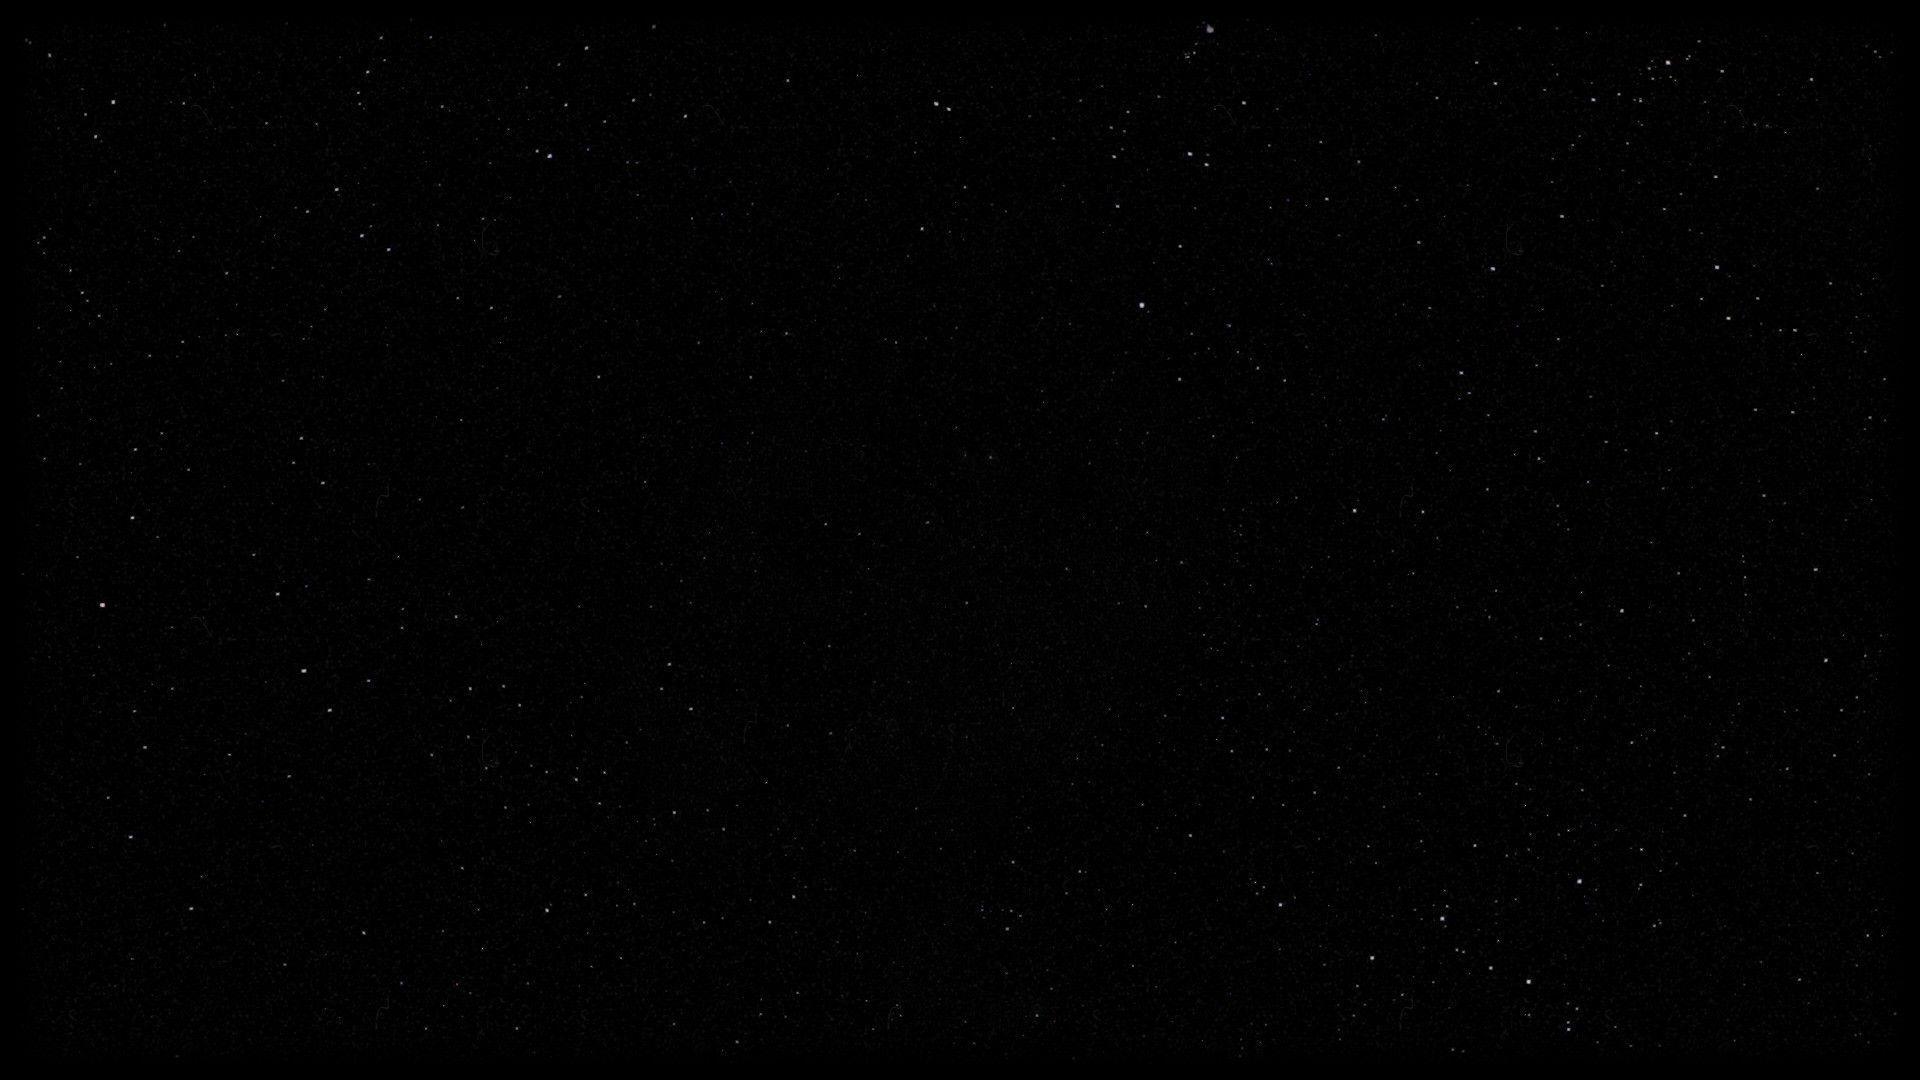 Black Asthetic Wallpapers - Top Free Black Asthetic ...